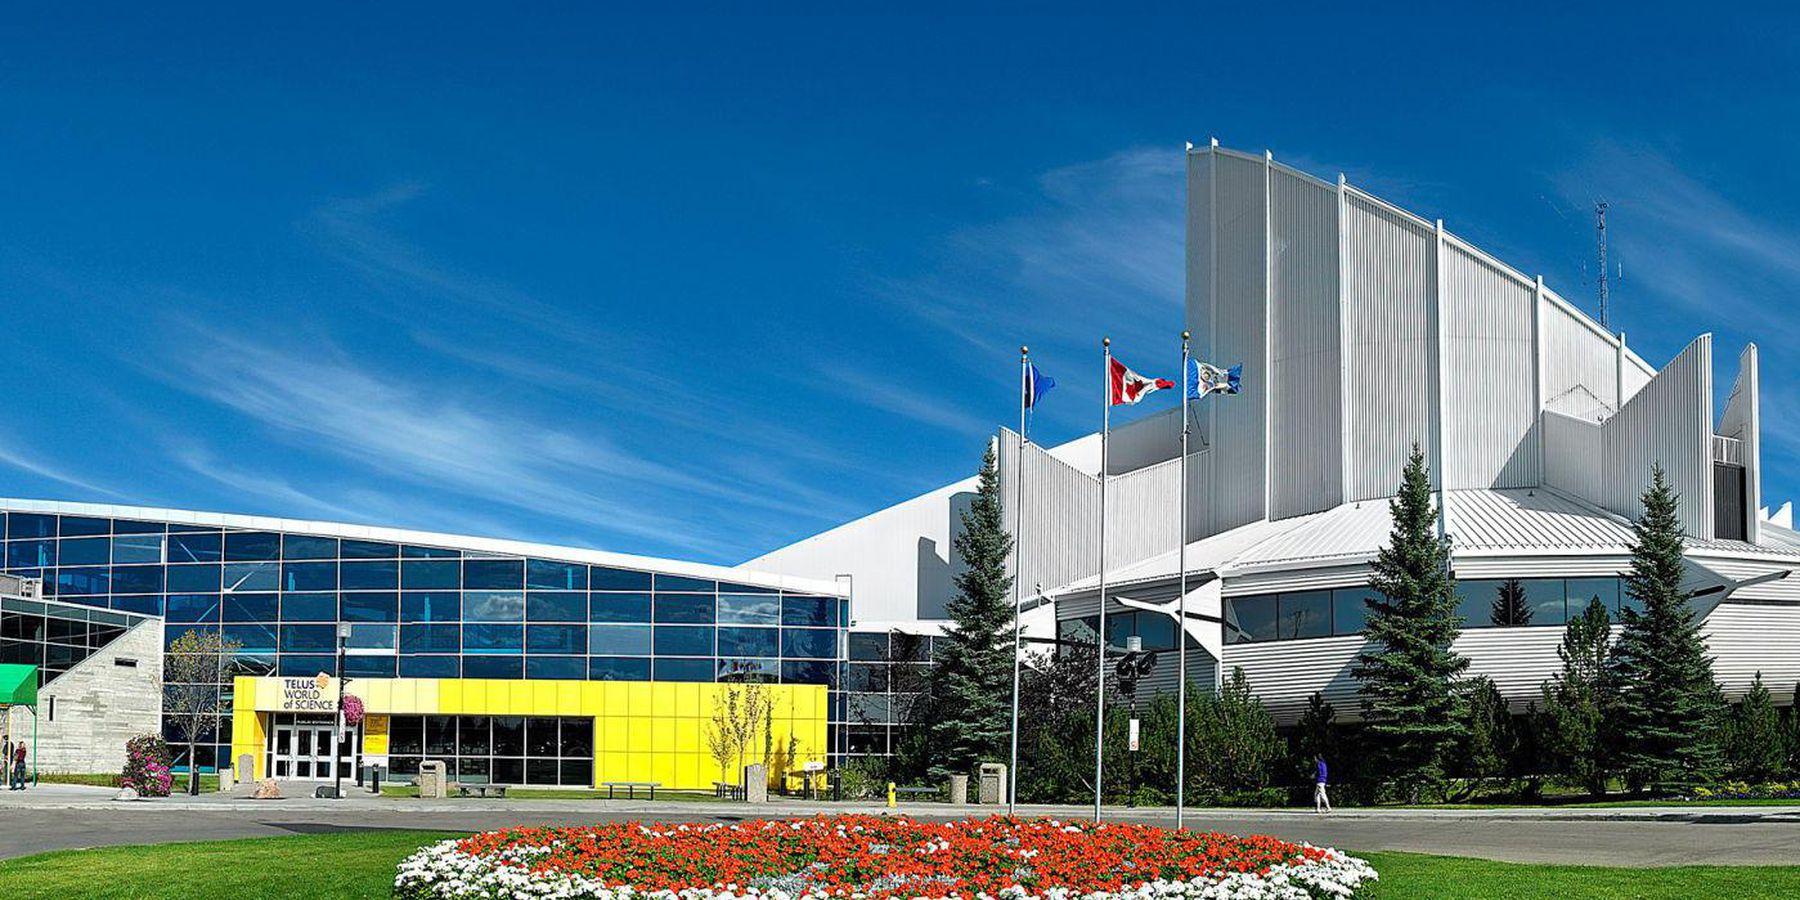 Telus World of Science - Alberta - Canada - Doets Reizen